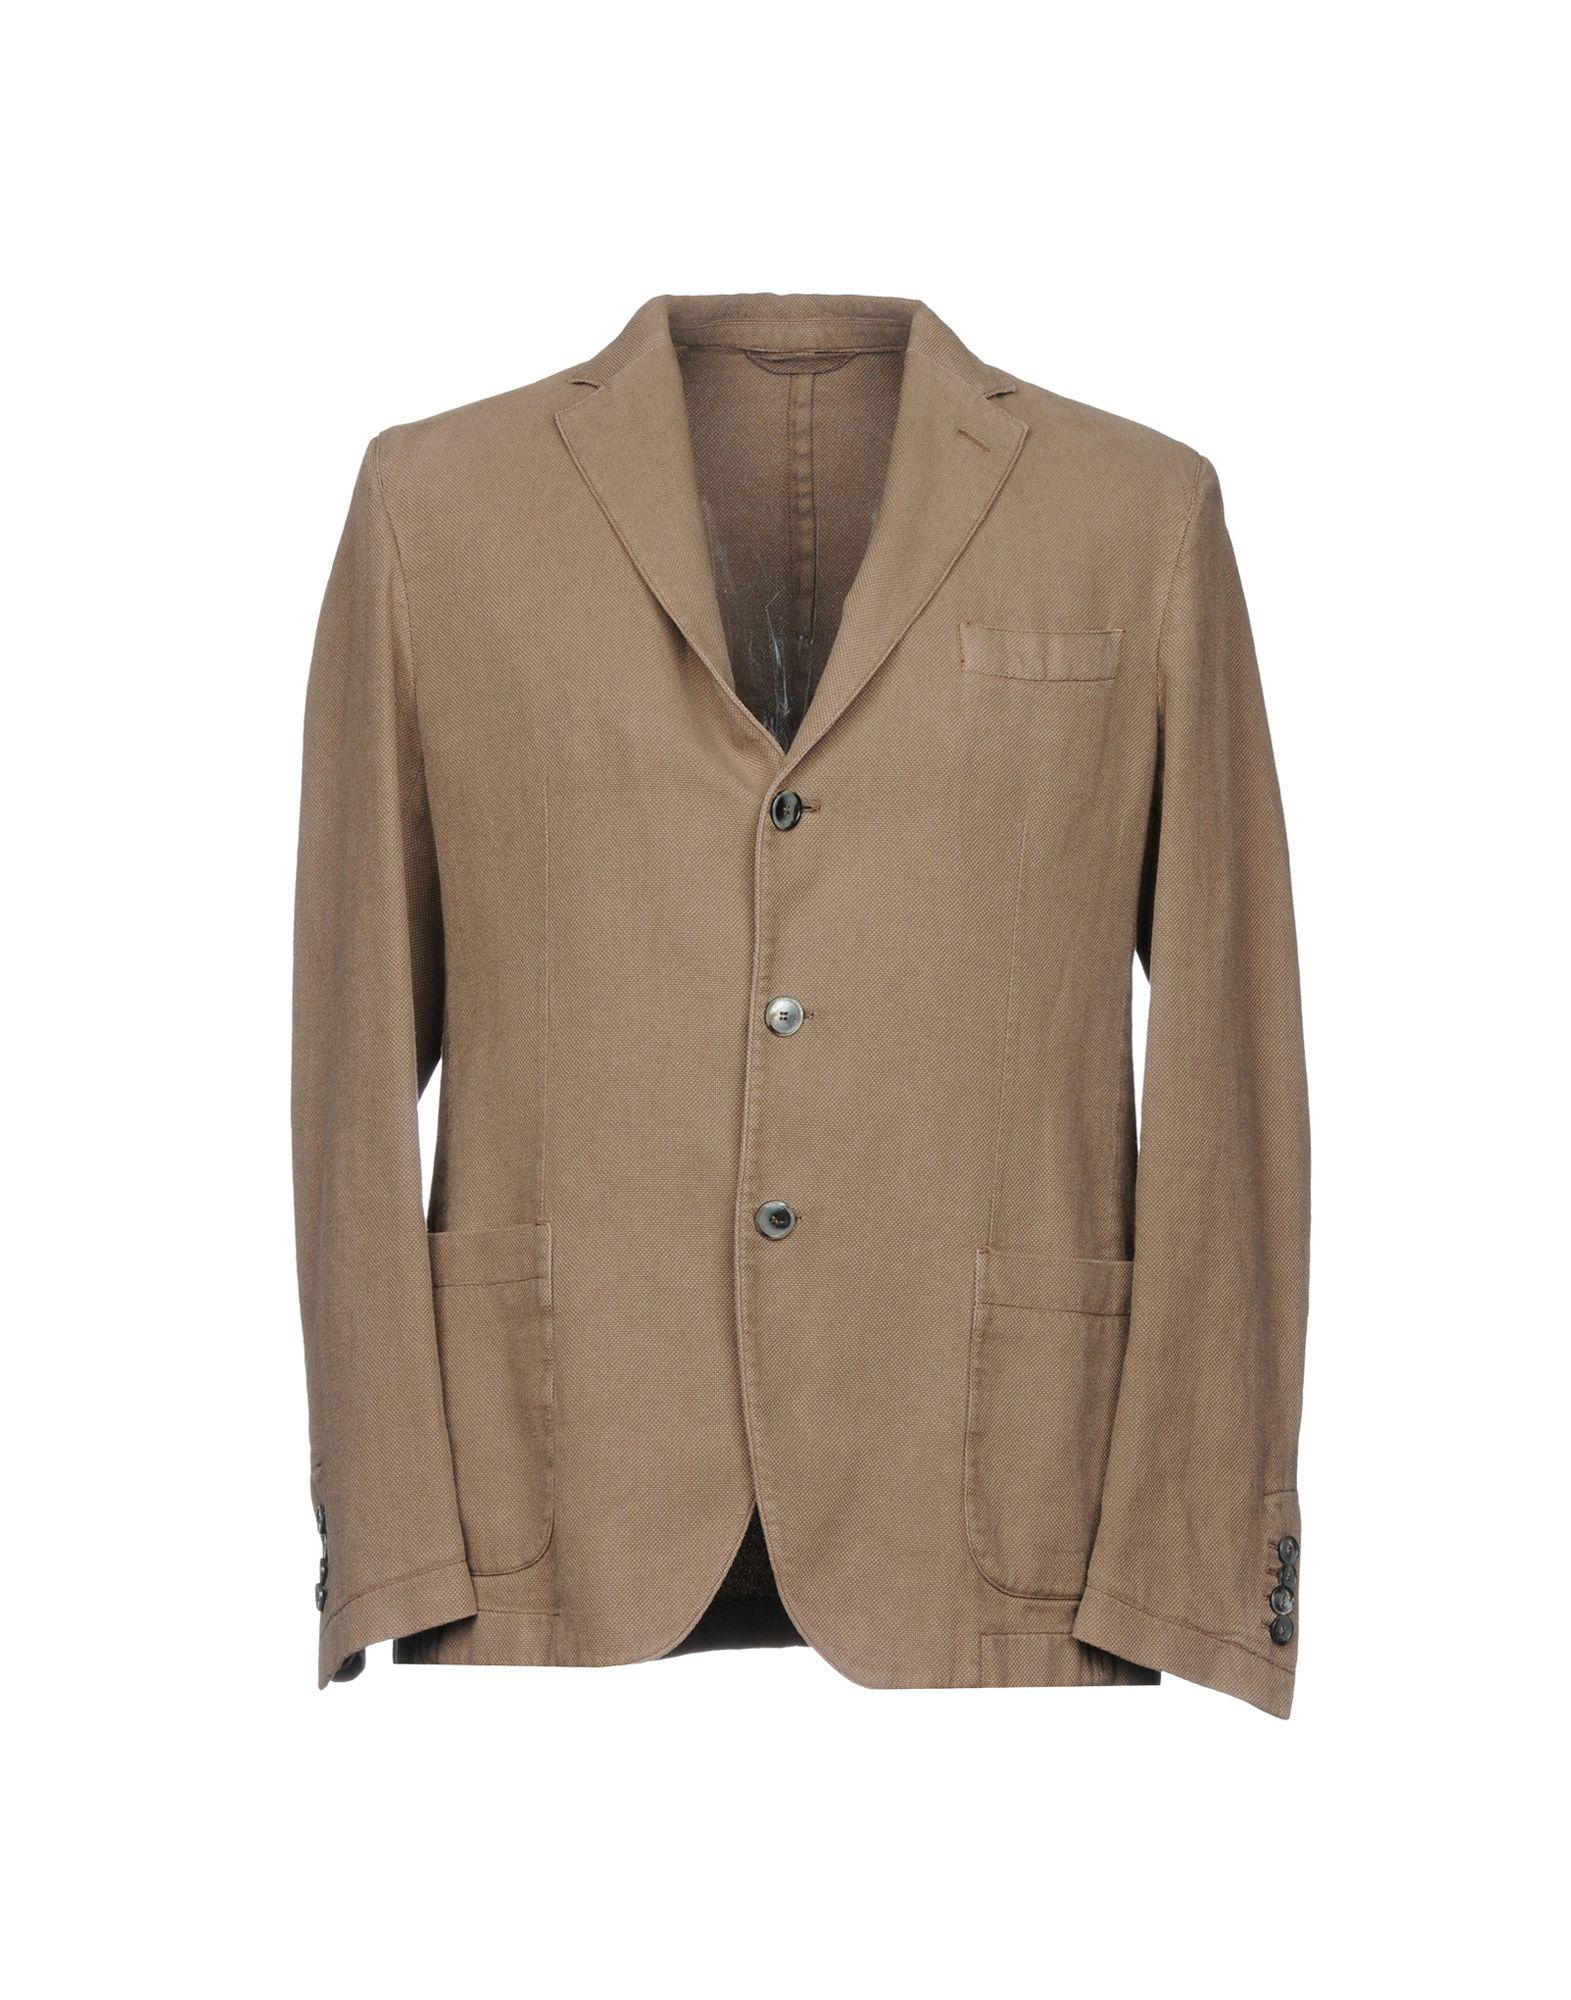 PANAMA JACKET Пиджак jackets modis m182s00041 down coat jacket for female for woman tmallfs